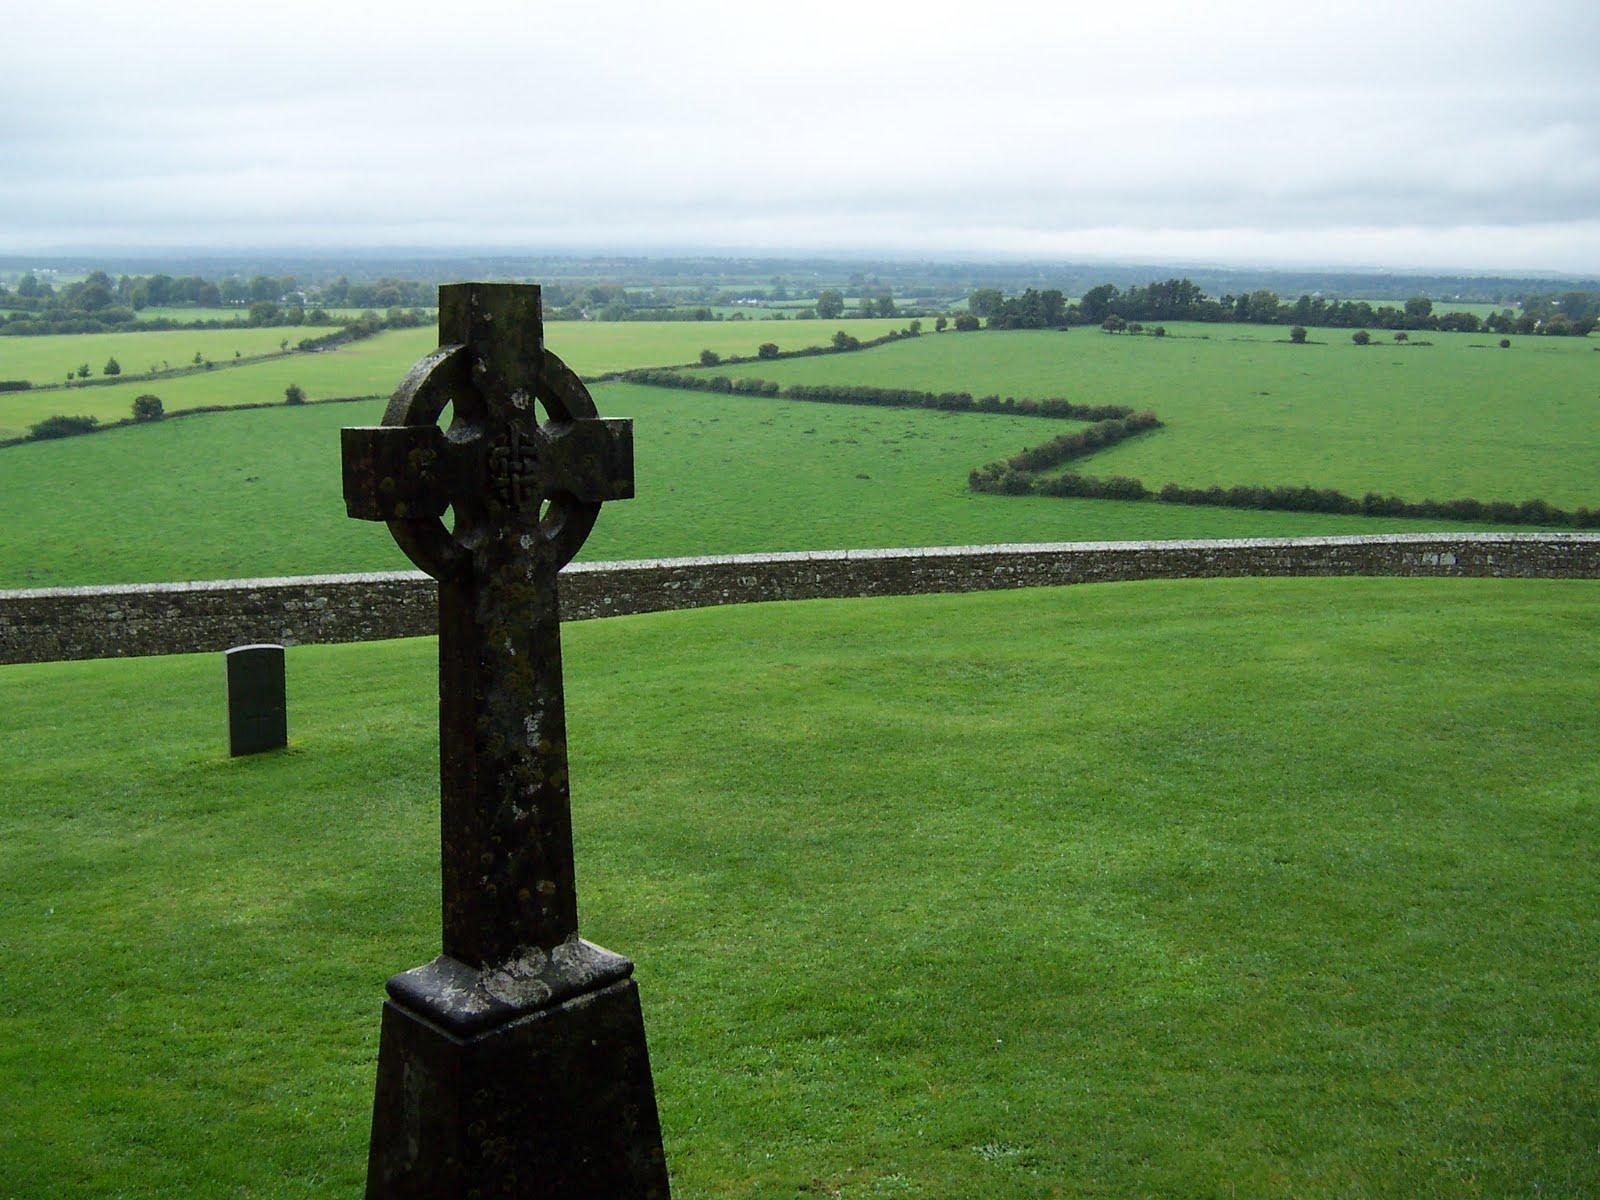 Irish Celtic Cross Wallpaper This celtic cross was at the 1600x1200